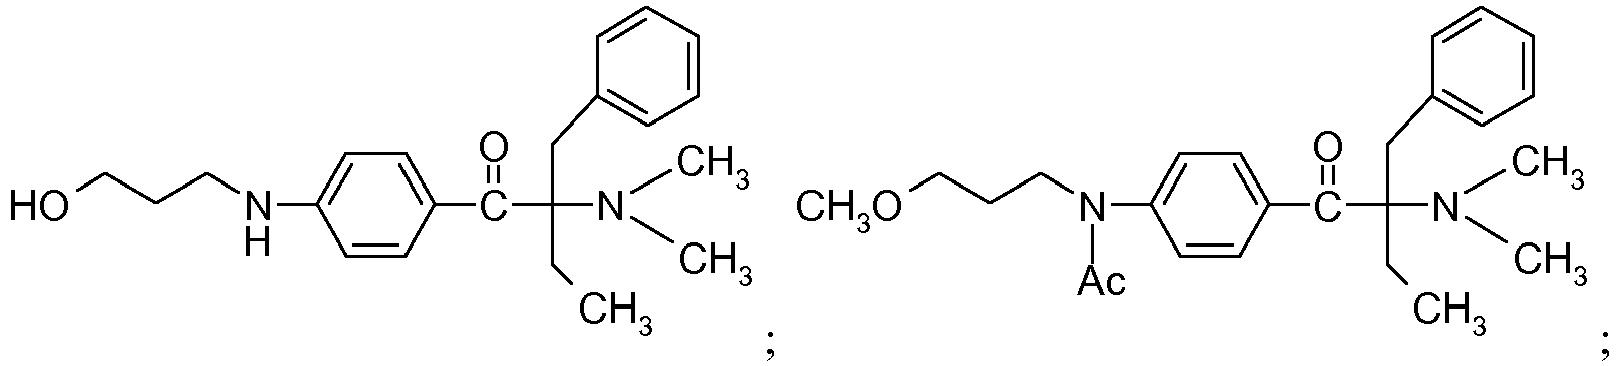 Figure imgb0336